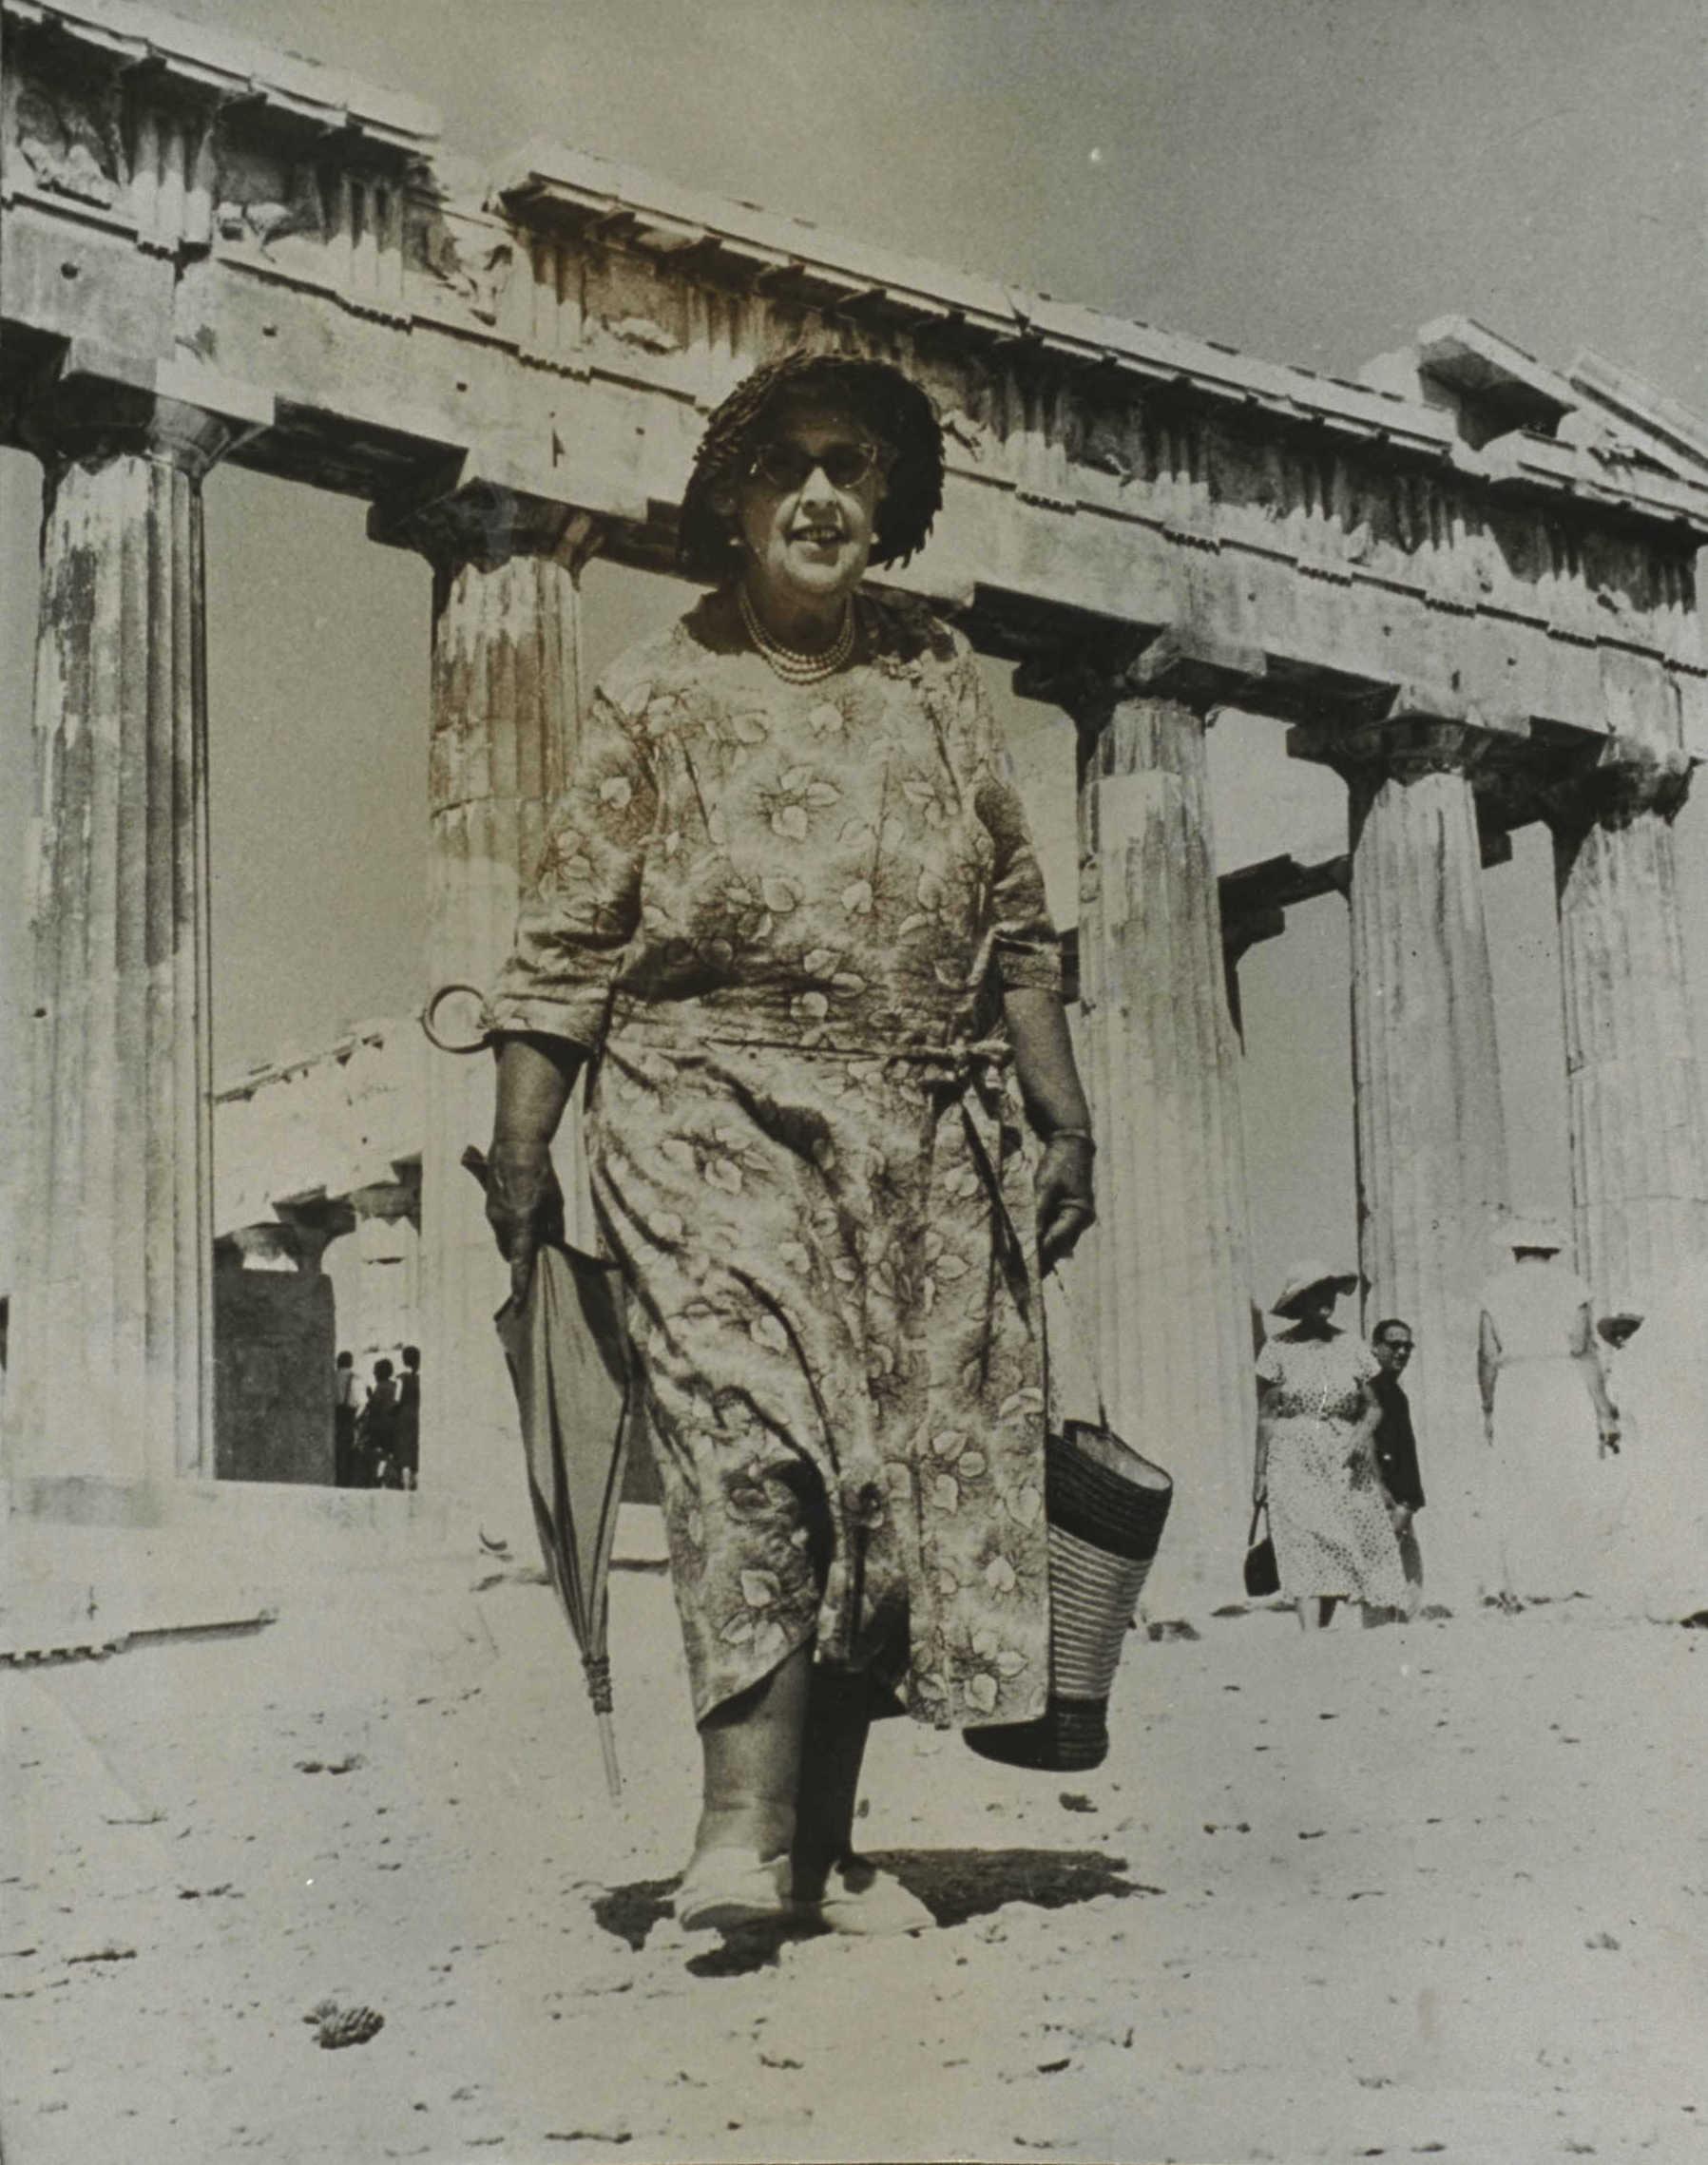 Stovi Akropolio kolonų fone.